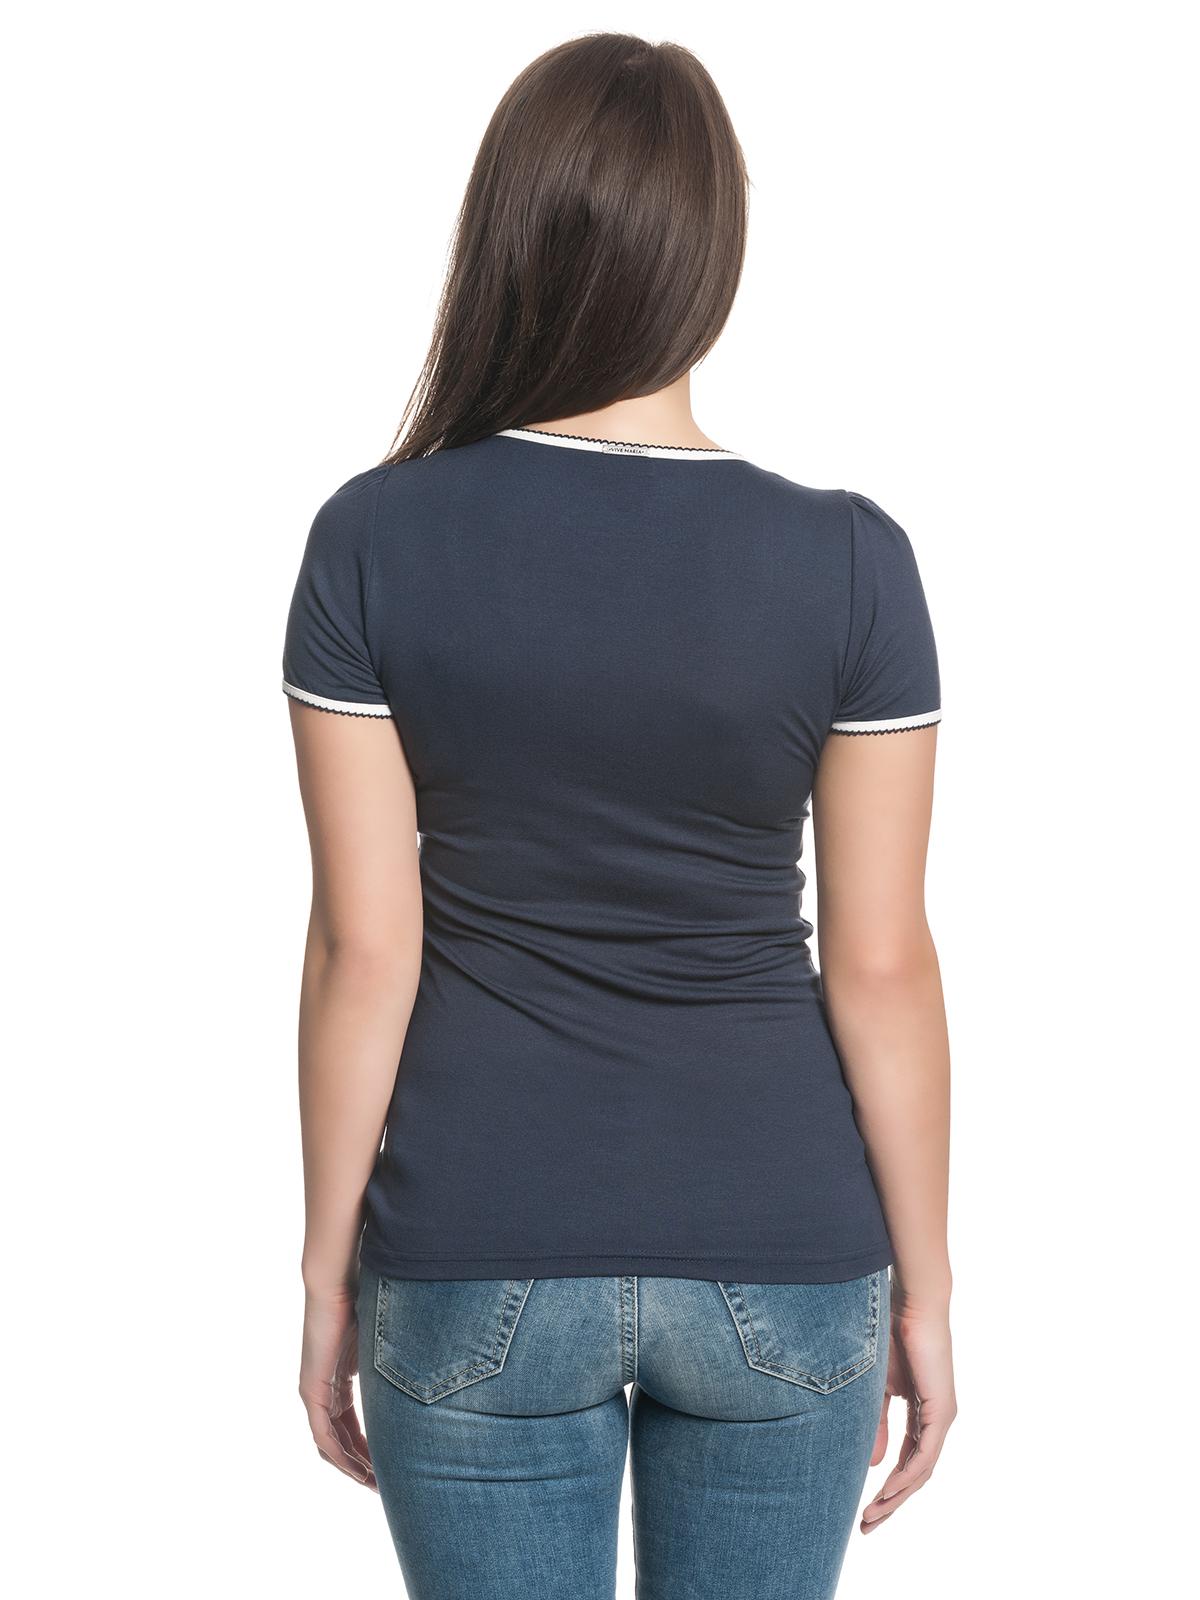 vive maria seaside damen t shirt dunkelblau damen t shirts tops blusen. Black Bedroom Furniture Sets. Home Design Ideas